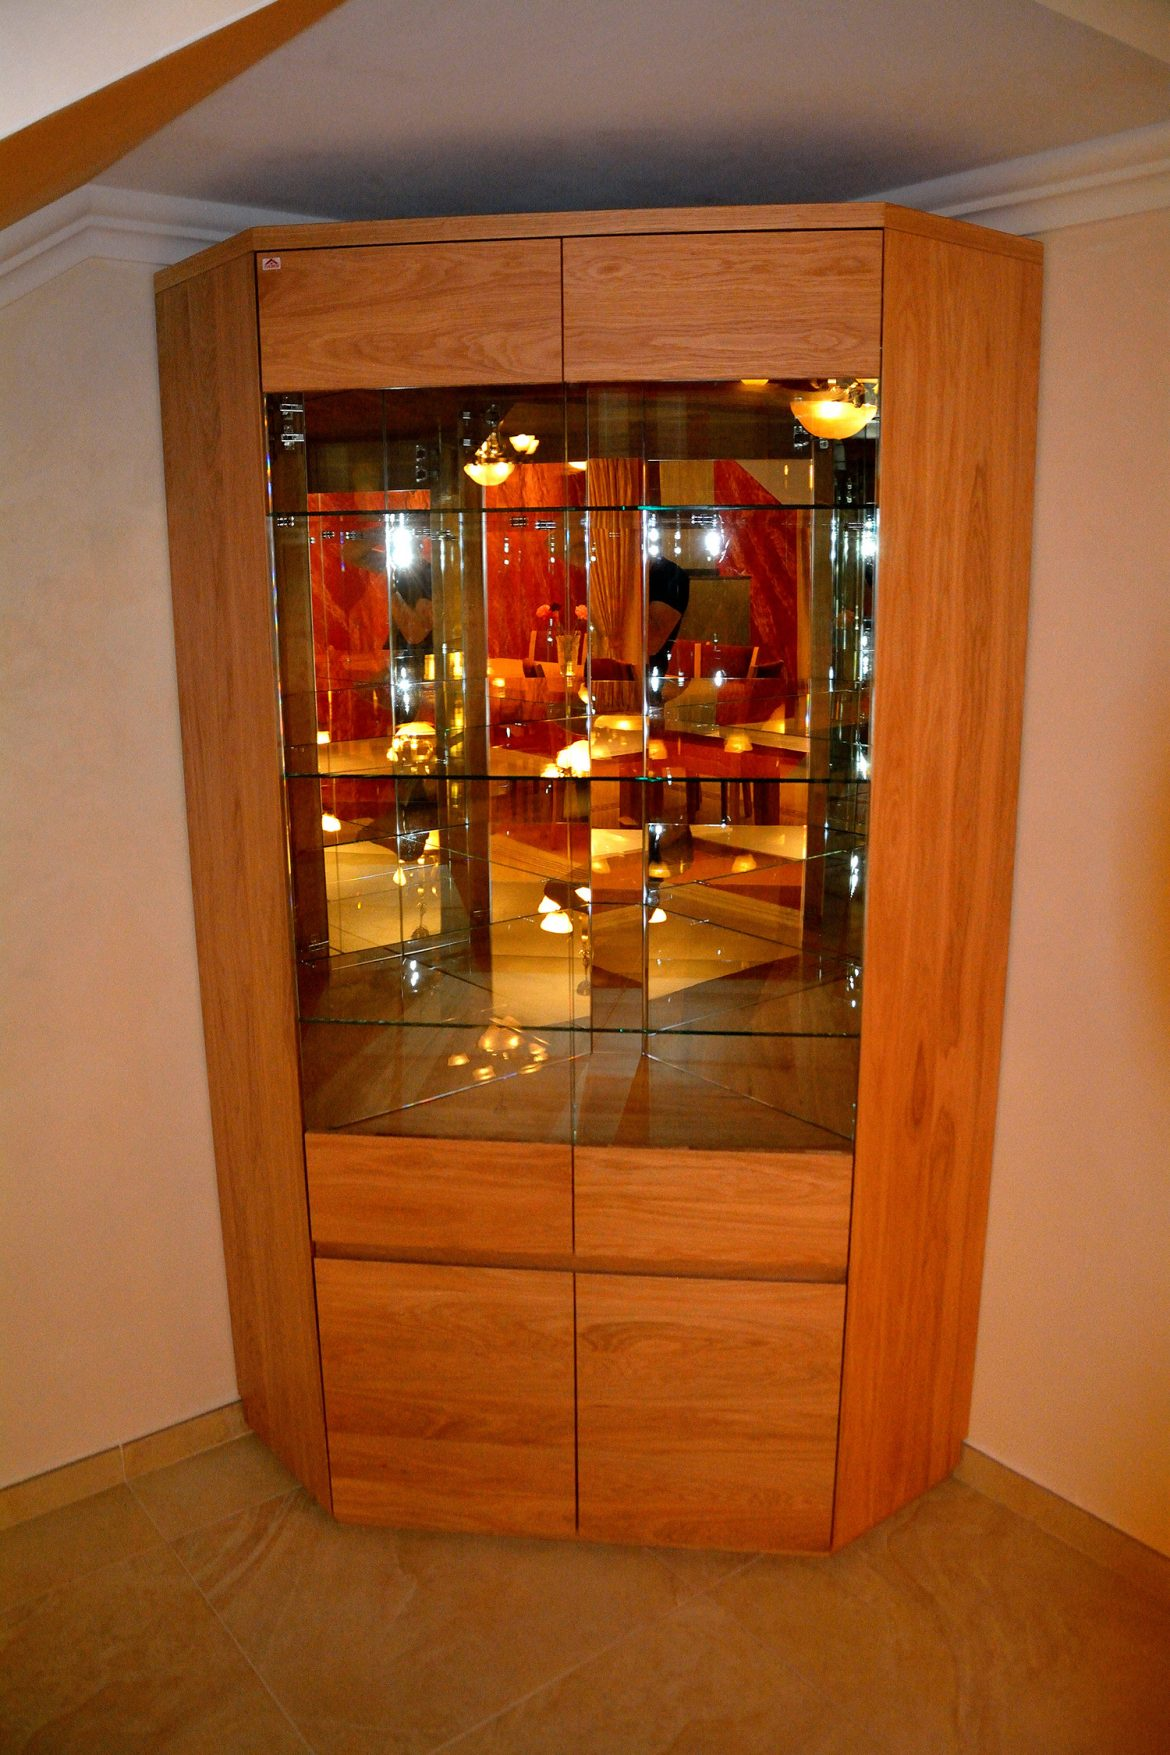 Vitrina Yulmob realizata pe comanda din lemn masiv stejar natur cu polite interioare din sticla si banda led